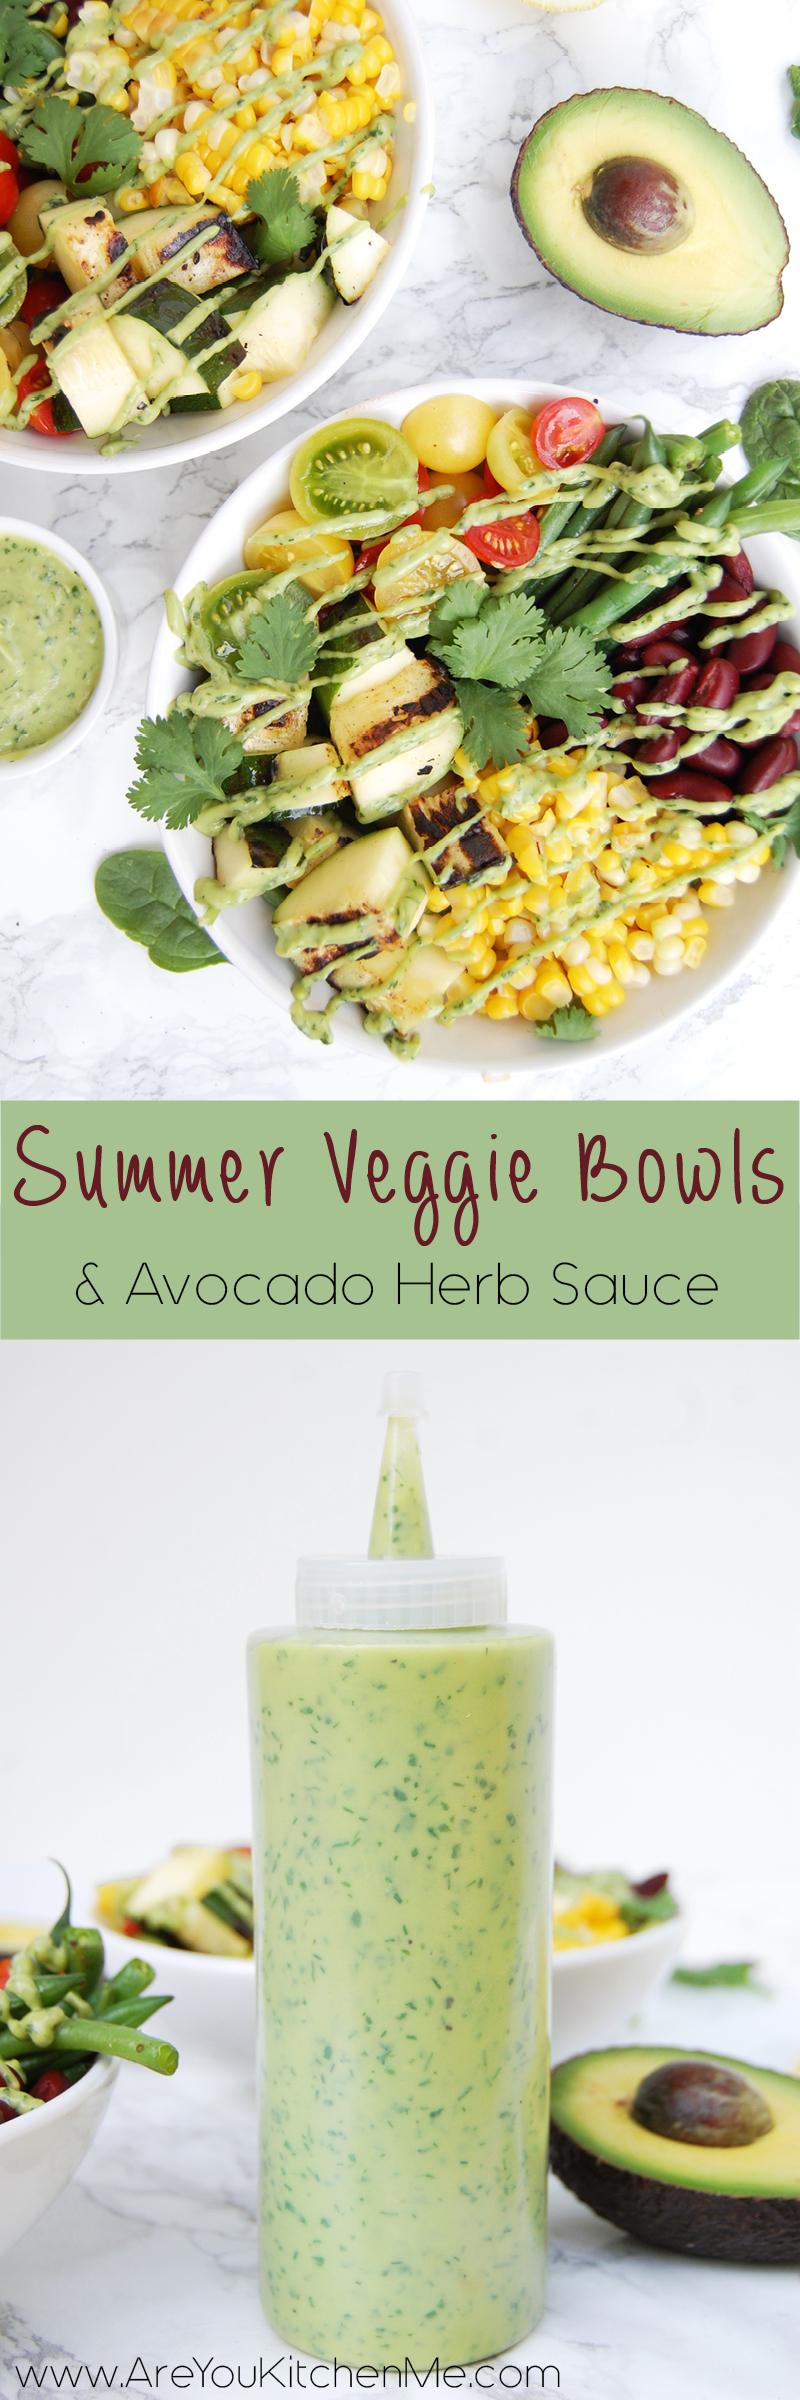 Summer Veggie Bowls w Avocado Cream Sauce | AreYouKitchenMe.com